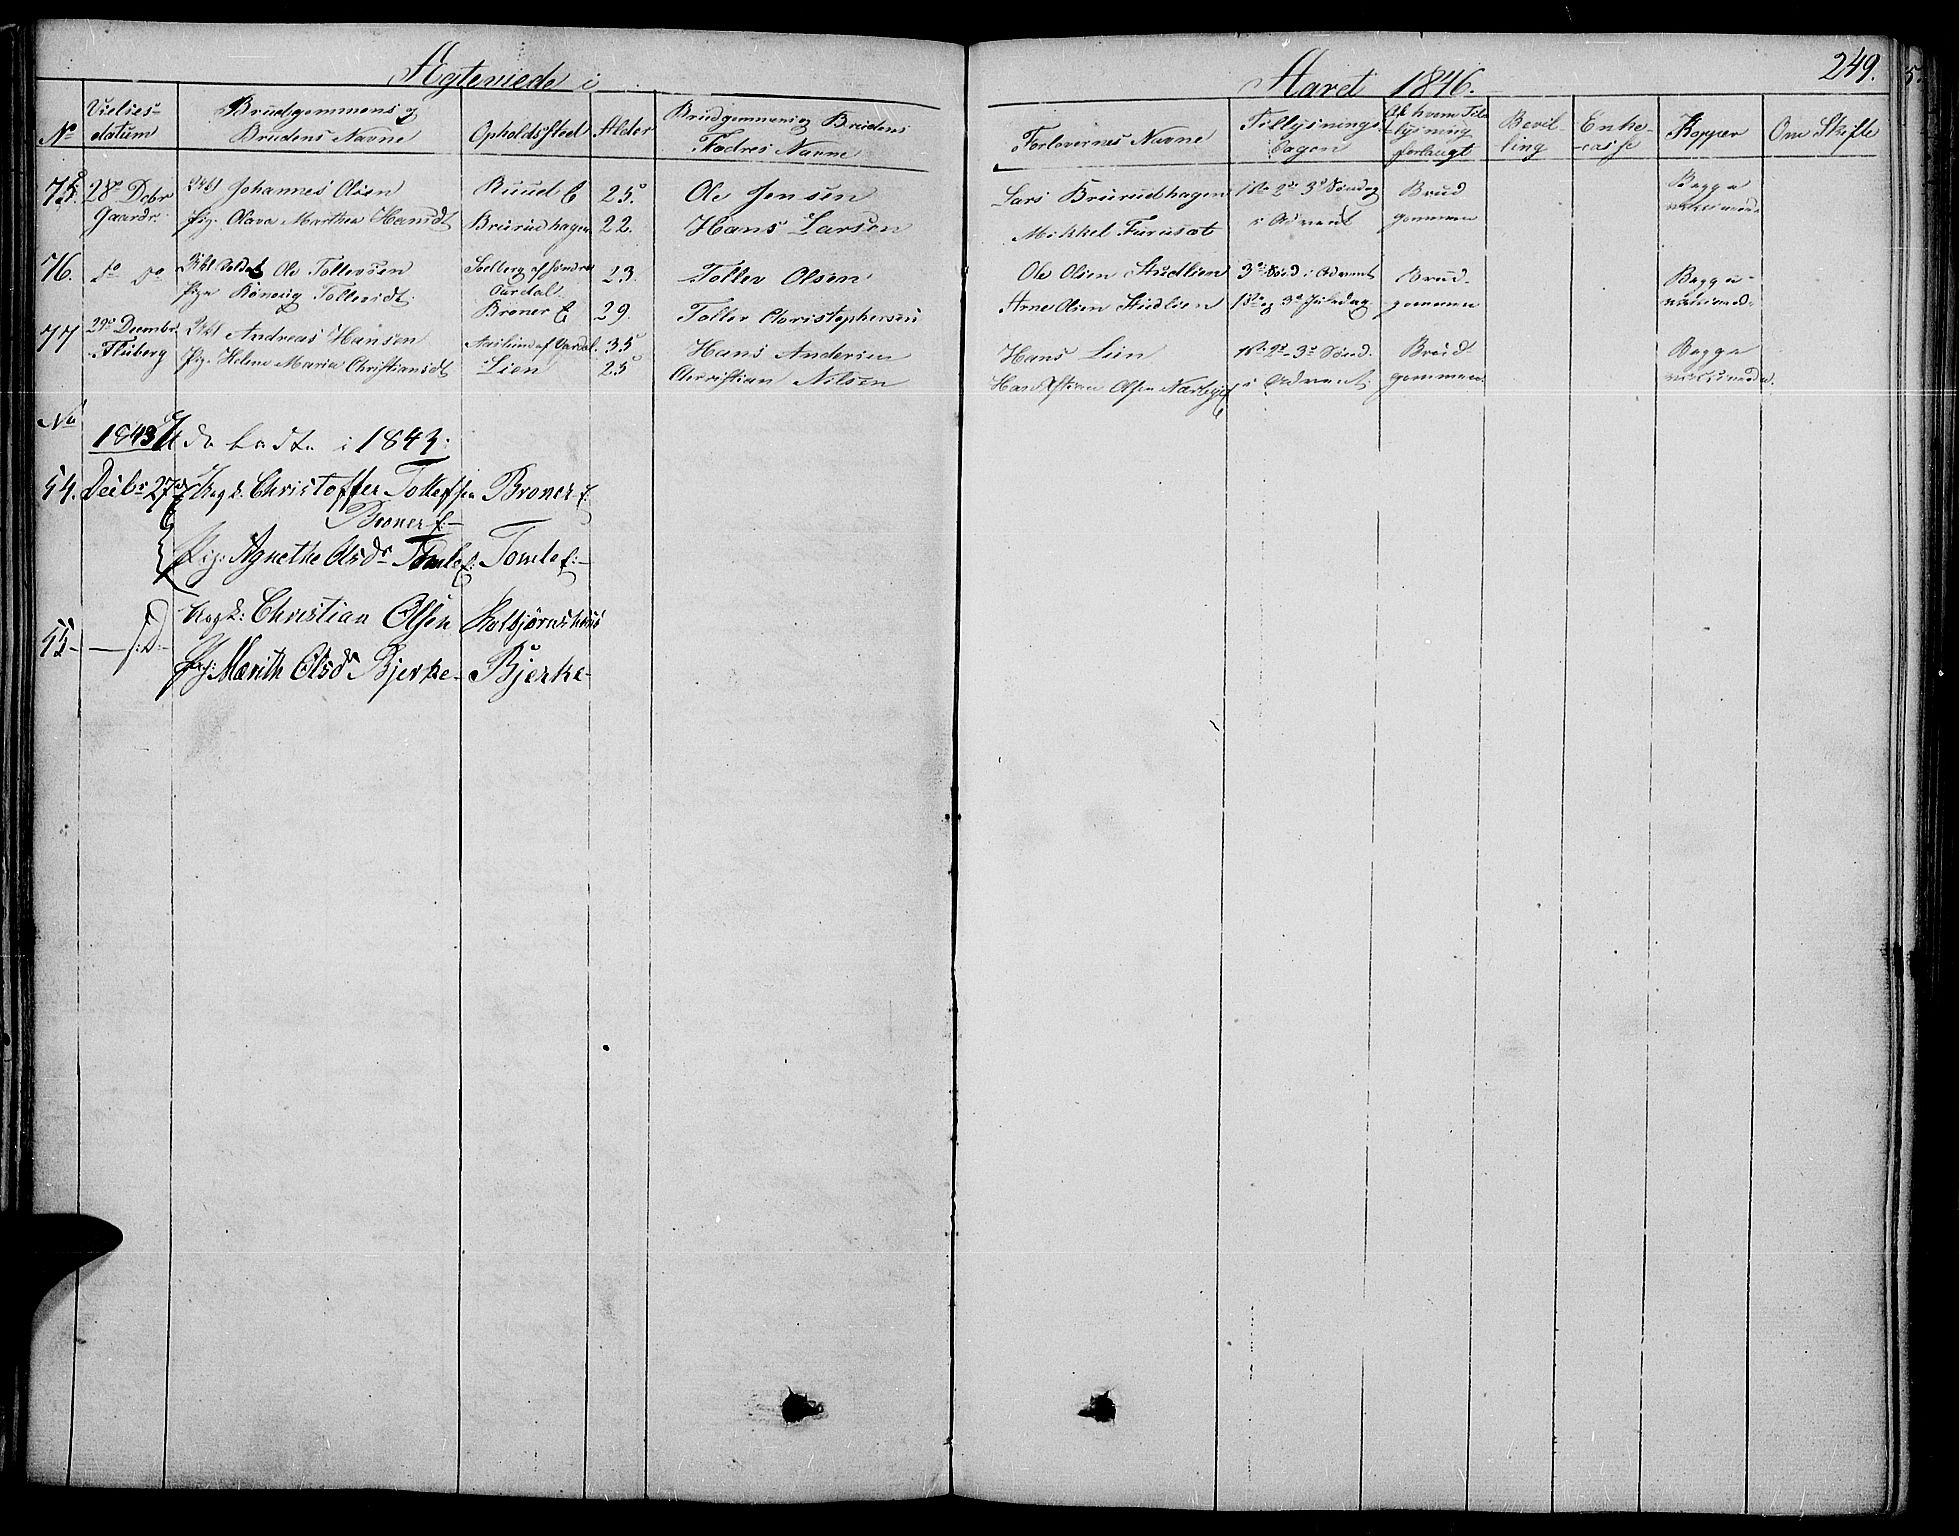 SAH, Land prestekontor, Ministerialbok nr. 8, 1830-1846, s. 249